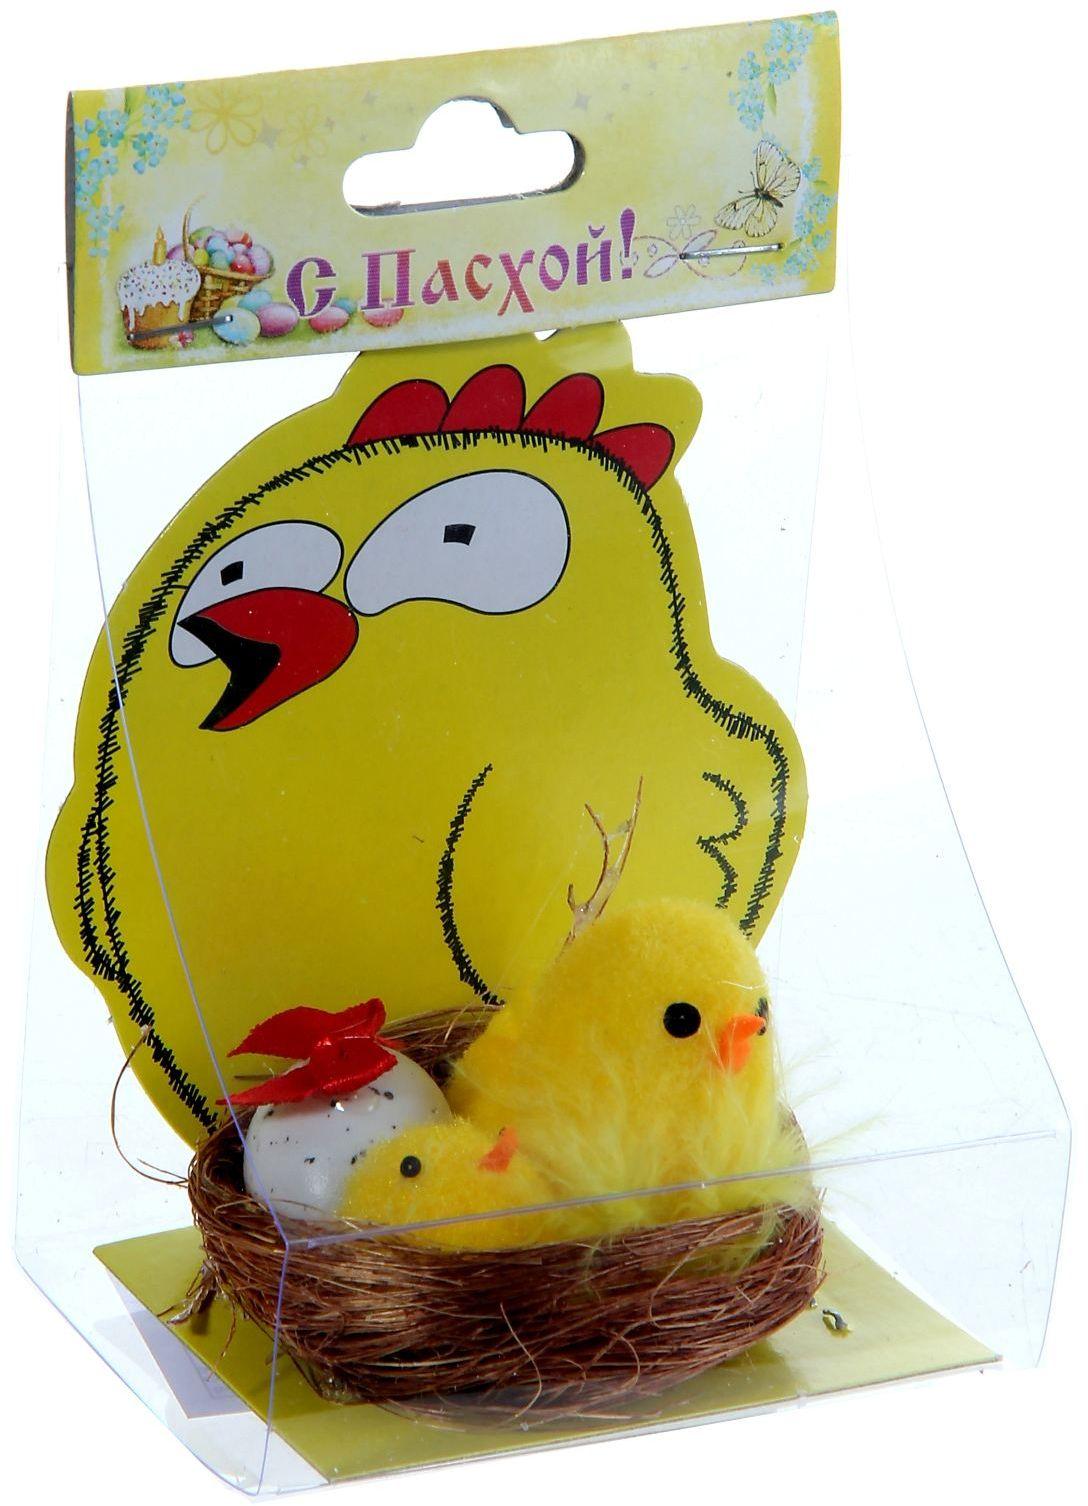 Сувенир пасхальный Sima-land Семейка цыплят, 5 х 5 х 4,5 см сувенир пасхальный sima land ангел с розочкой на платье 13 х 8 х 6 см